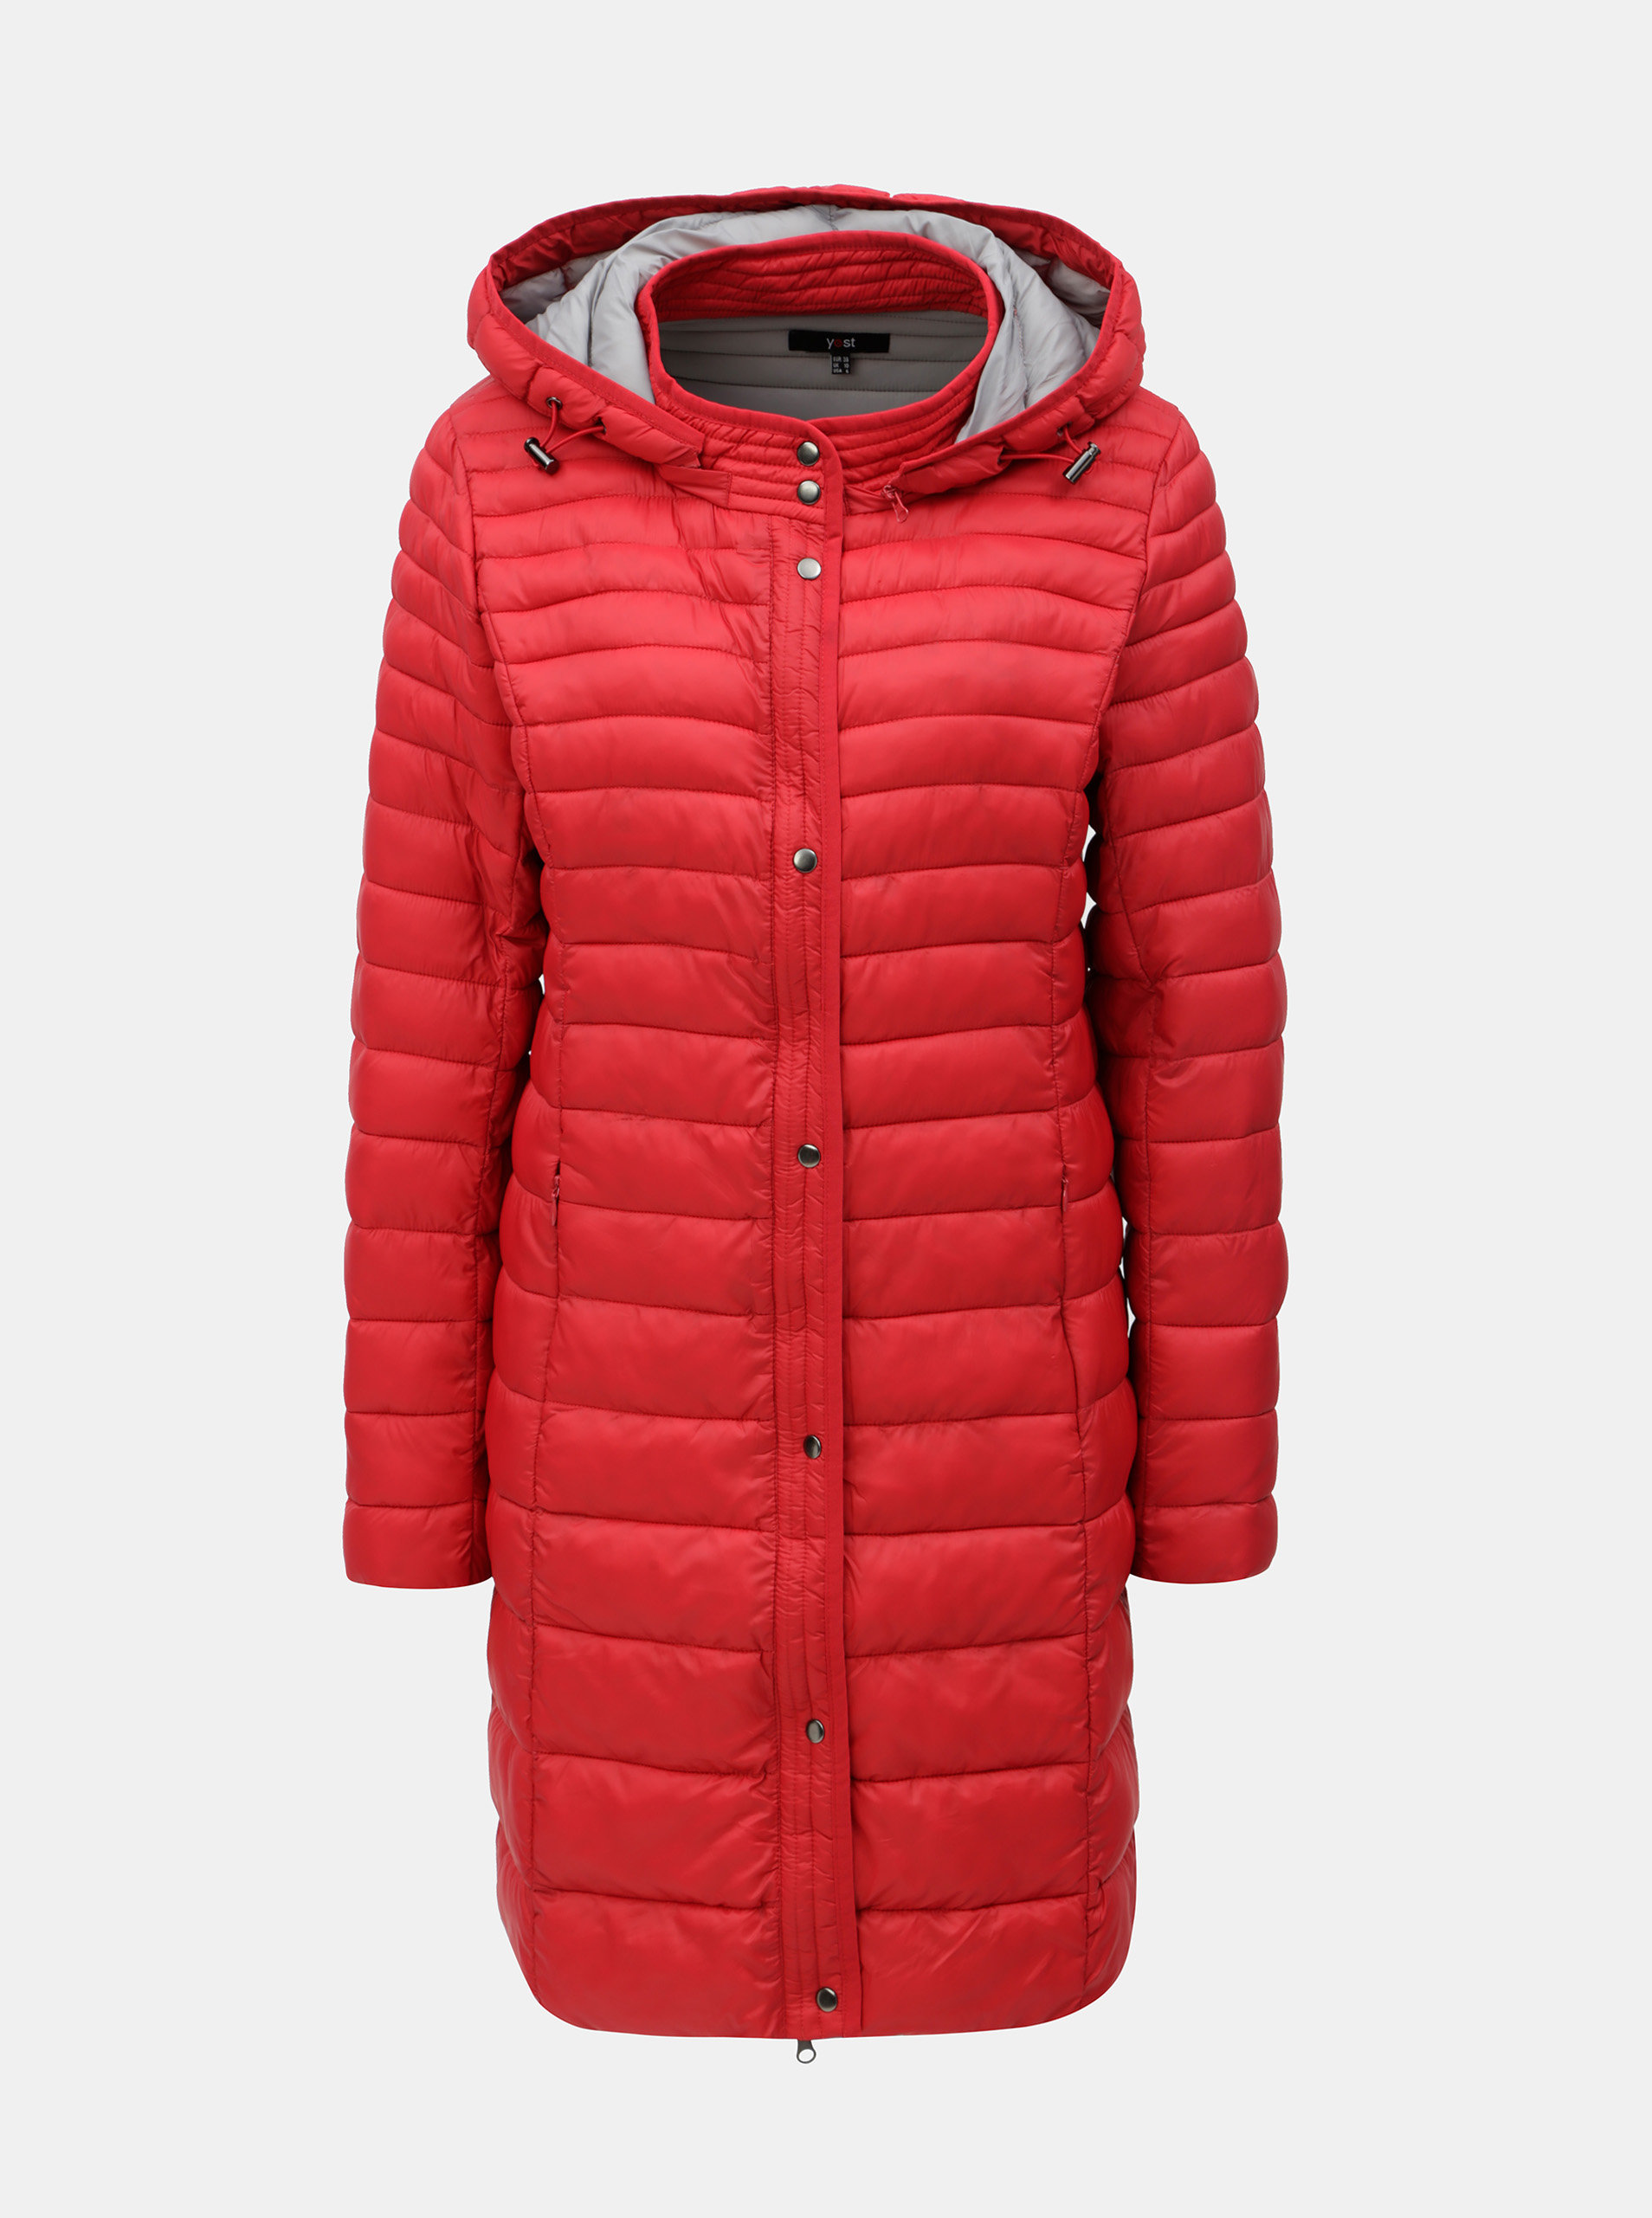 Červený prešívaný kabát s kapucňou Yest ... 720ab928382